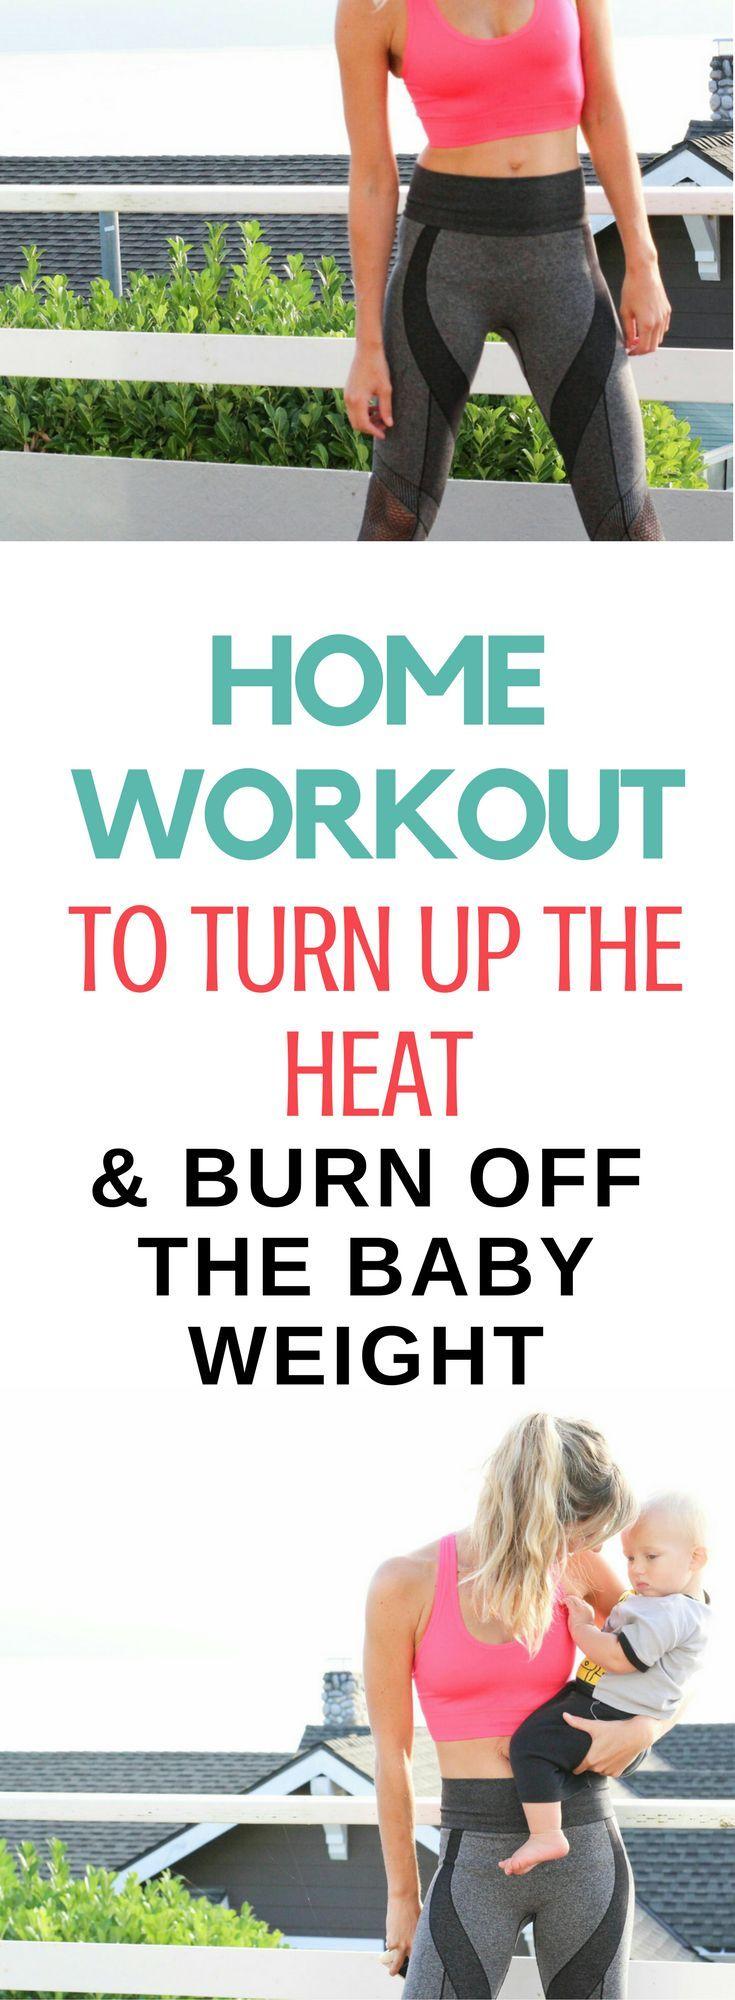 Pilates lose stomach fat picture 1